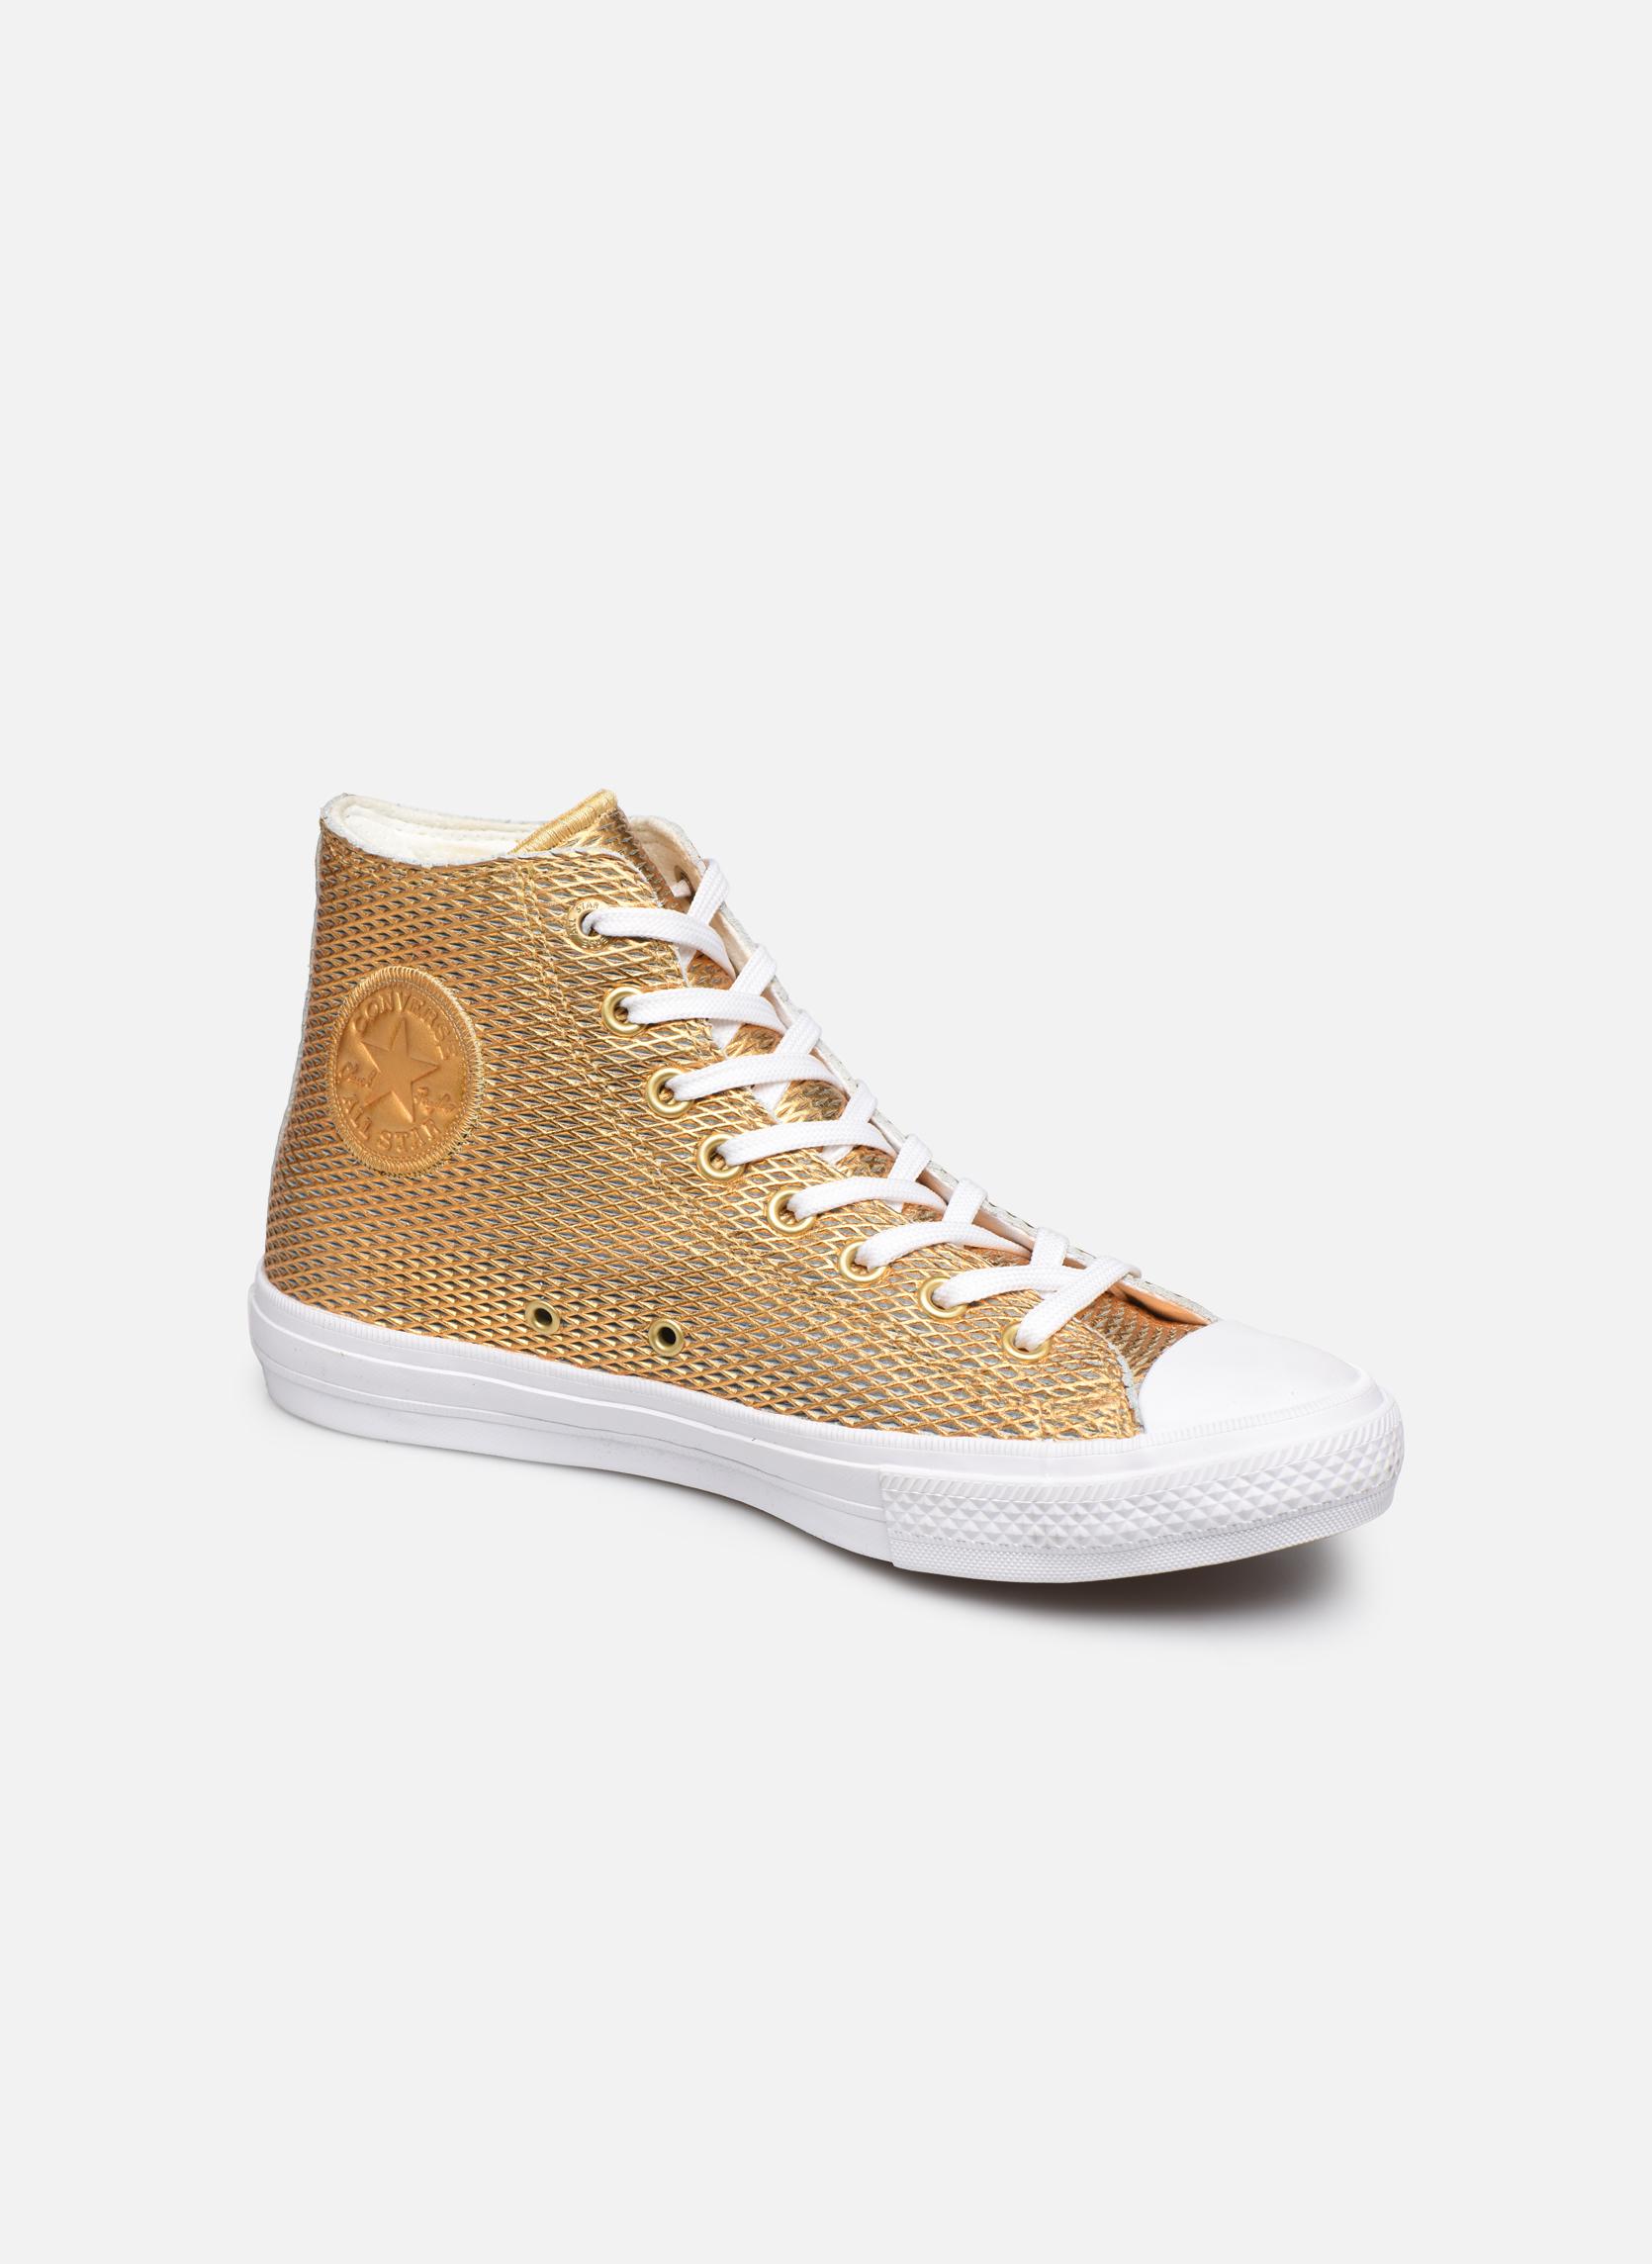 Sneakers Kvinder Chuck Taylor All Star II Hi Perf Metallic Leather